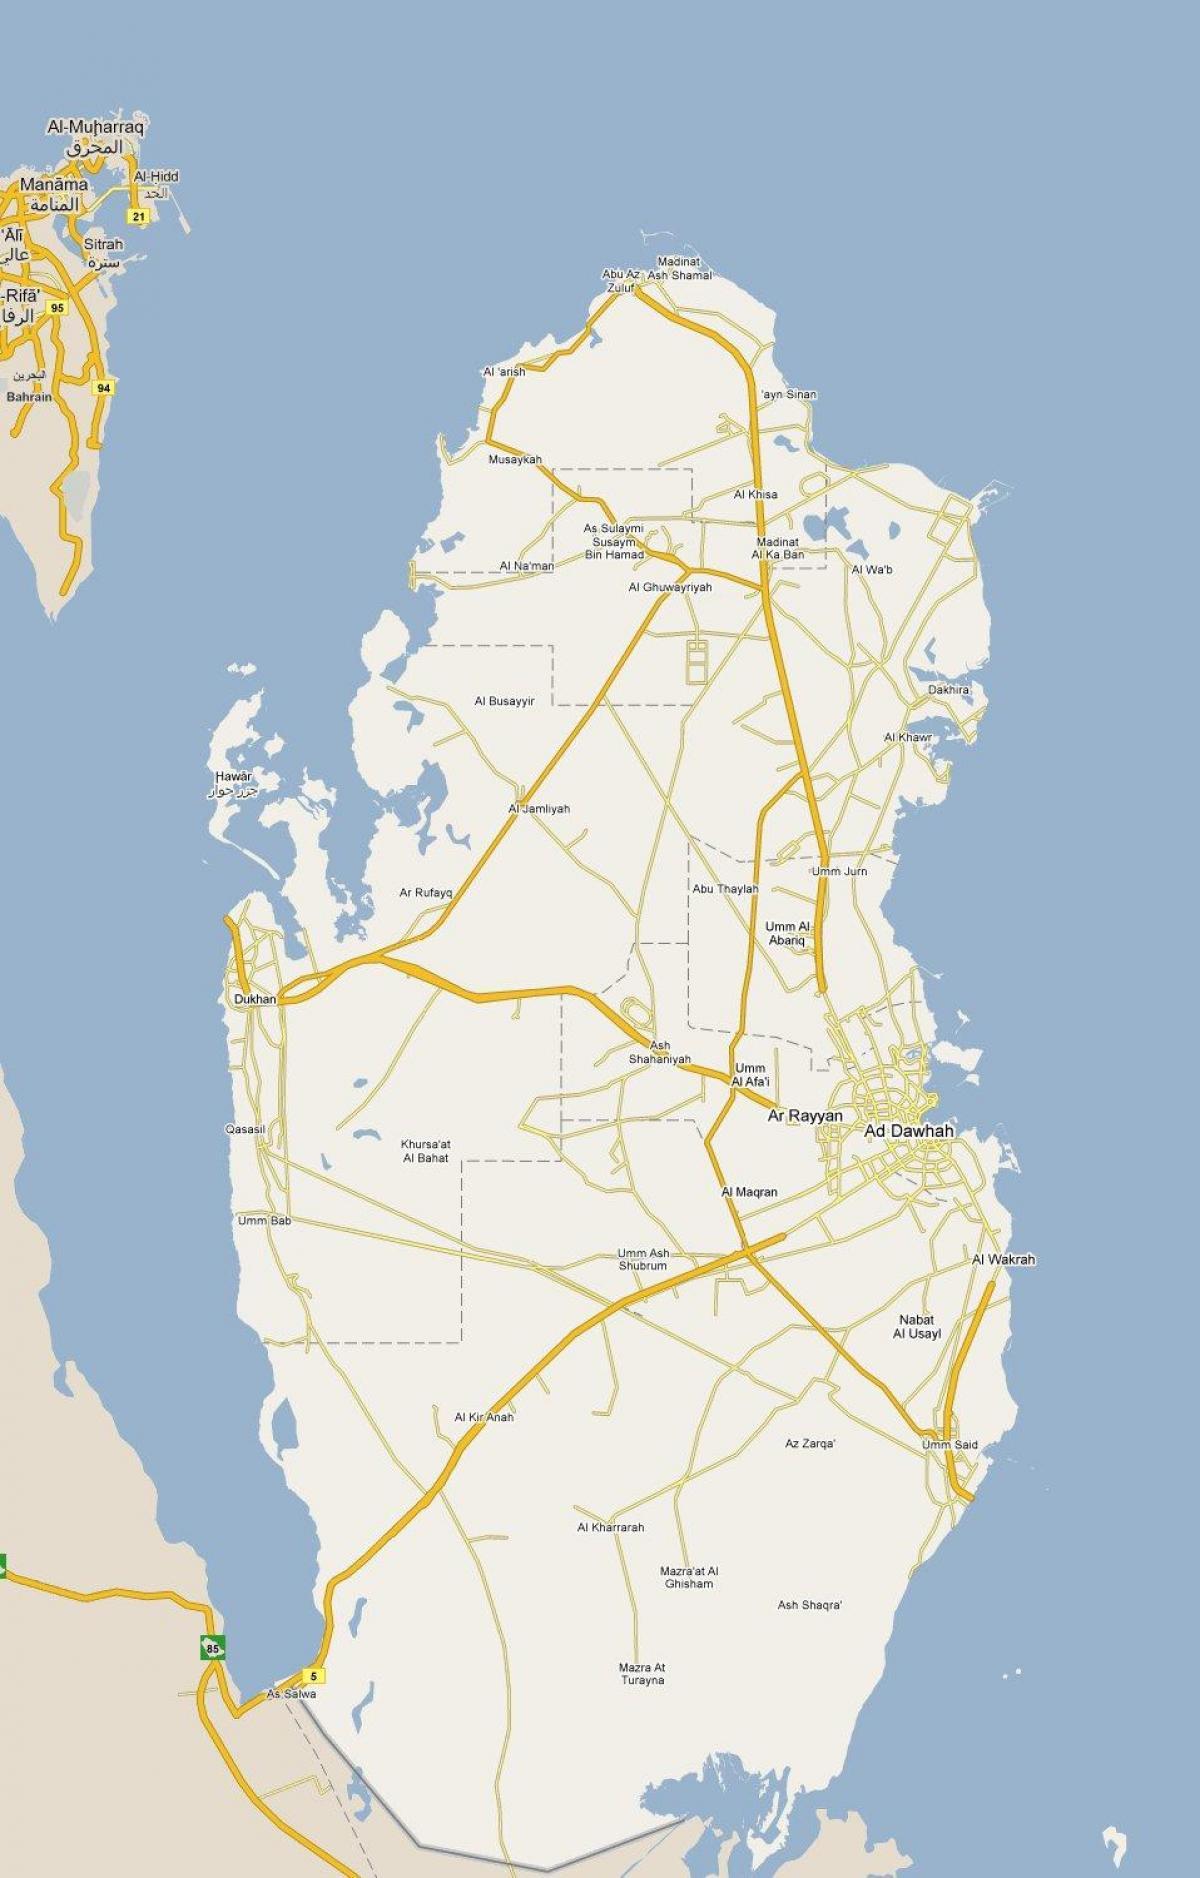 Map of qatar - Map showing qatar (Western Asia - Asia) Qatar Map on kenya map, angola map, luxembourg map, middle east map, bahrain map, namibia map, japan map, rwanda map, asia map, zimbabwe map, united arab emirates map, madagascar map, uganda map, balkans map, kuwait map, algeria map, turkey map, malawi map, niger map, ghana map, senegal map, u.a.e. map, cameroon map, ethiopia map, jordan map, mozambique map, tunisia map, abu dhabi map, asian countries map, syria map, burundi map, sudan map, dubai map, morocco map, aruba map, mali map, israel map, iraq map, persian gulf map,